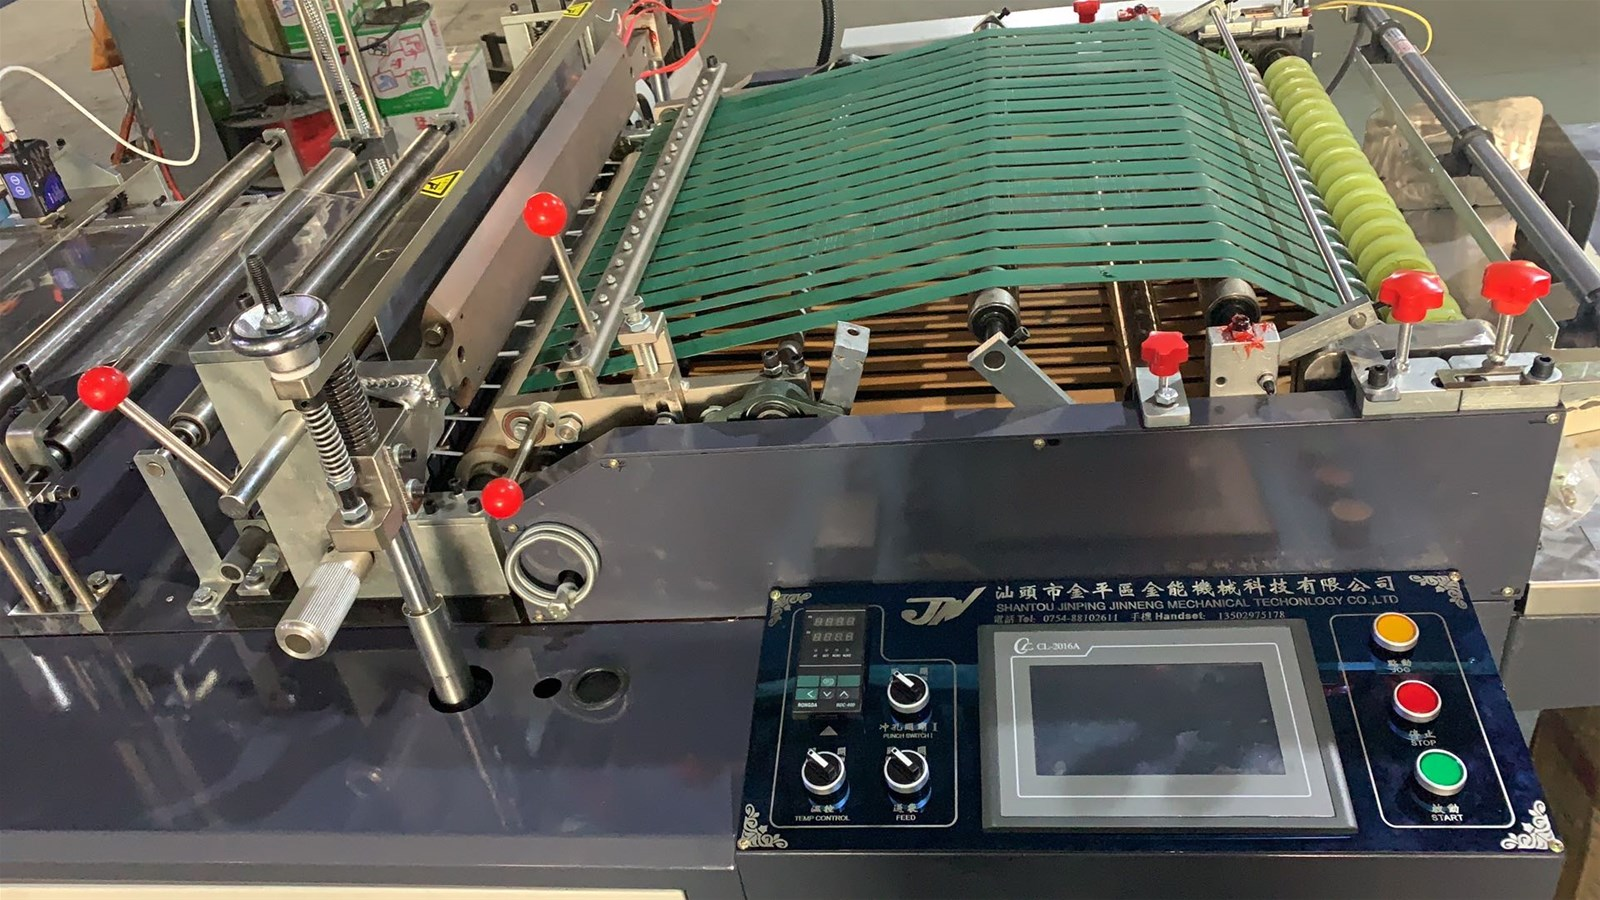 Fullyautomatic hispeed heating cutting machine